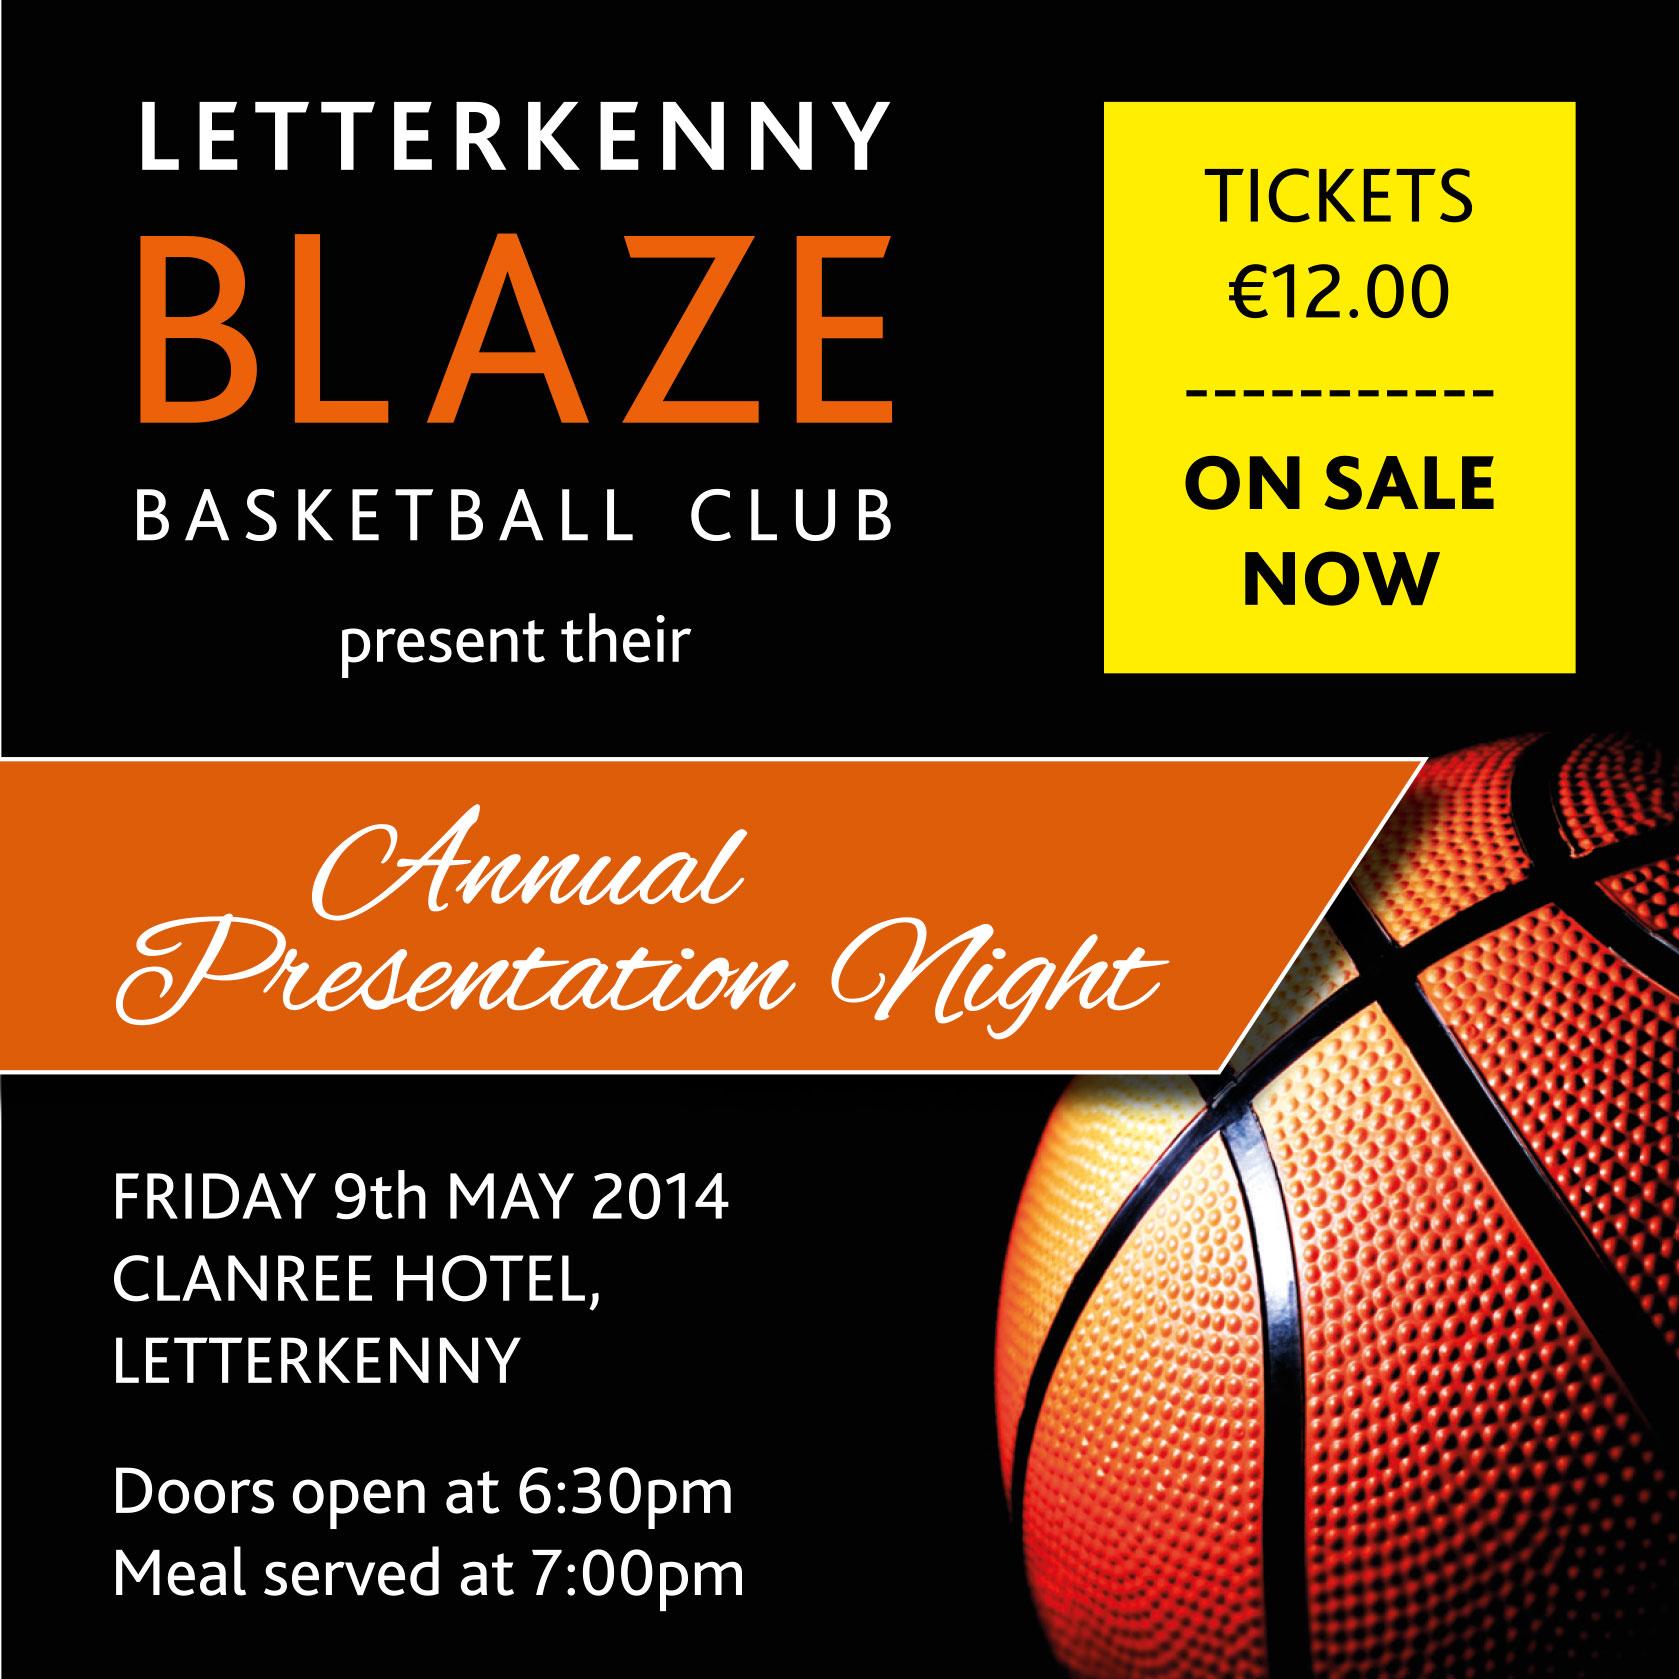 blaze basketball annual presentation night friday 9th may 2014